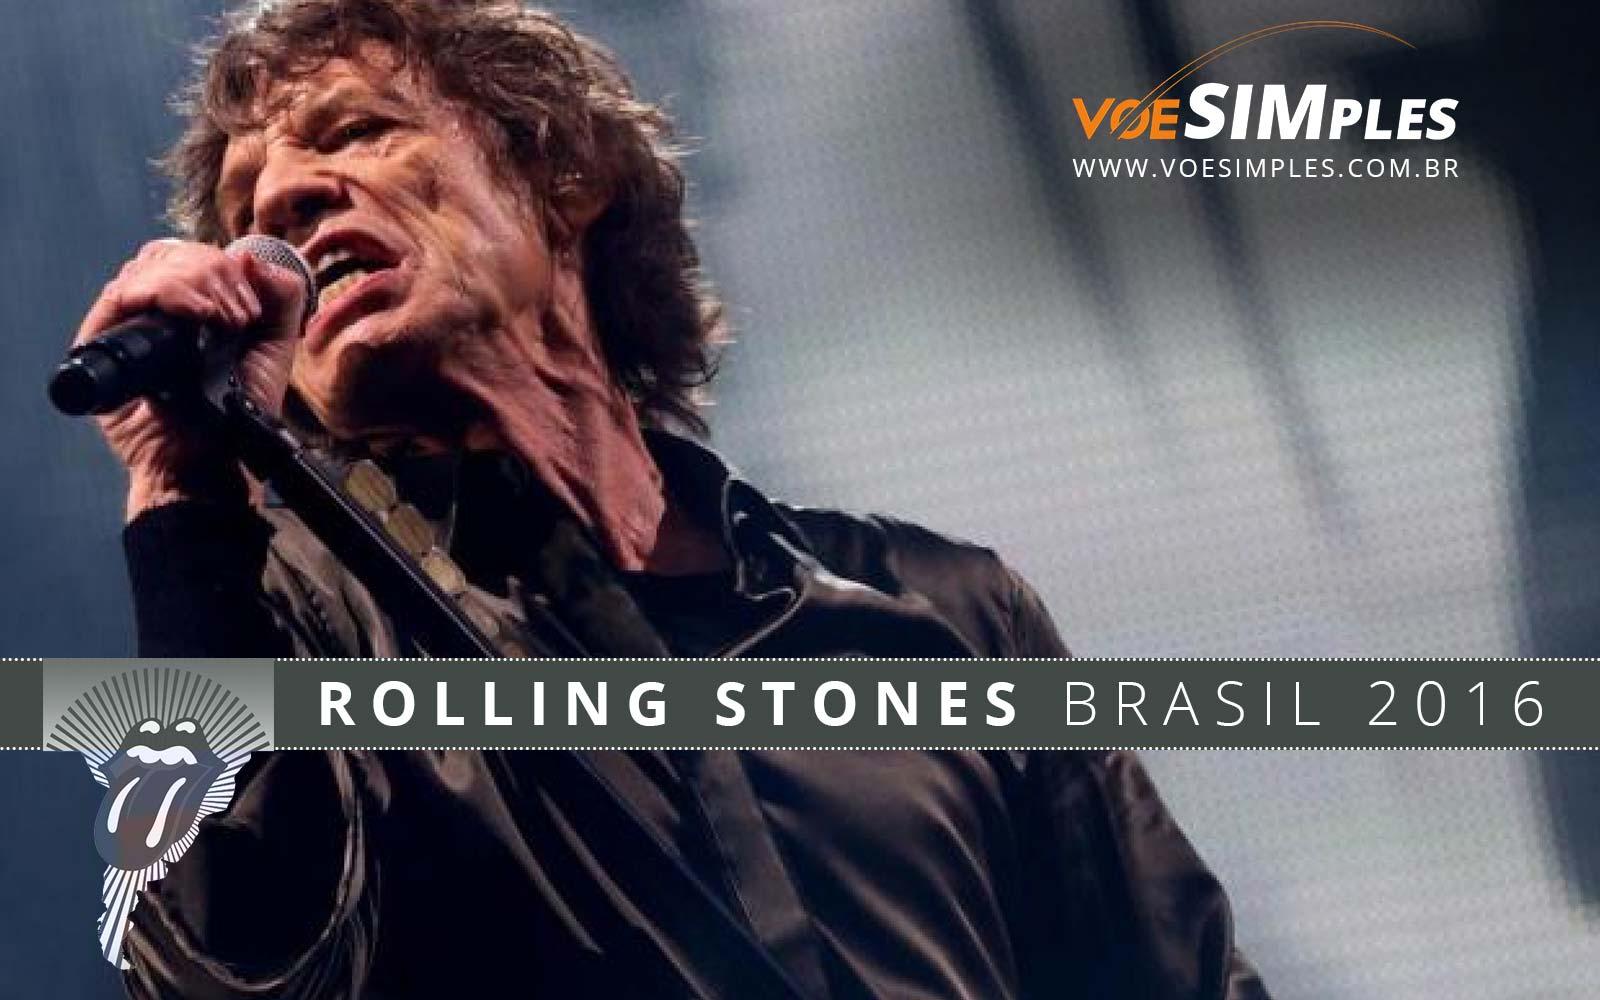 passagem-aerea-promocional-rolling-stones-brasil-2016-passagens-promocionais-rolling-stones-brasil-2016